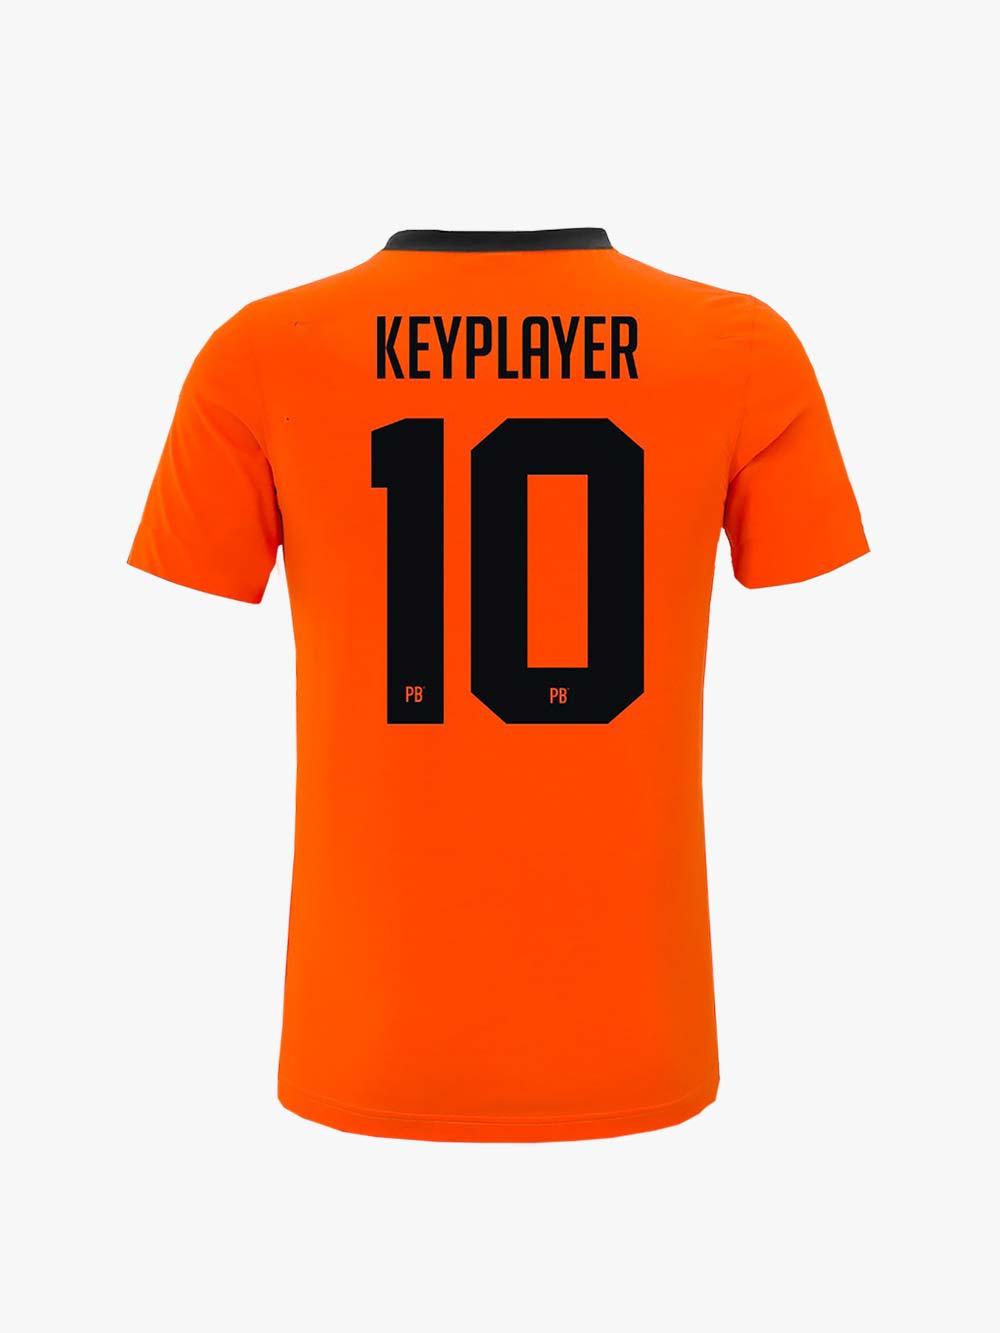 Malelions-10-Keyplayer-EK2021-shirt-back